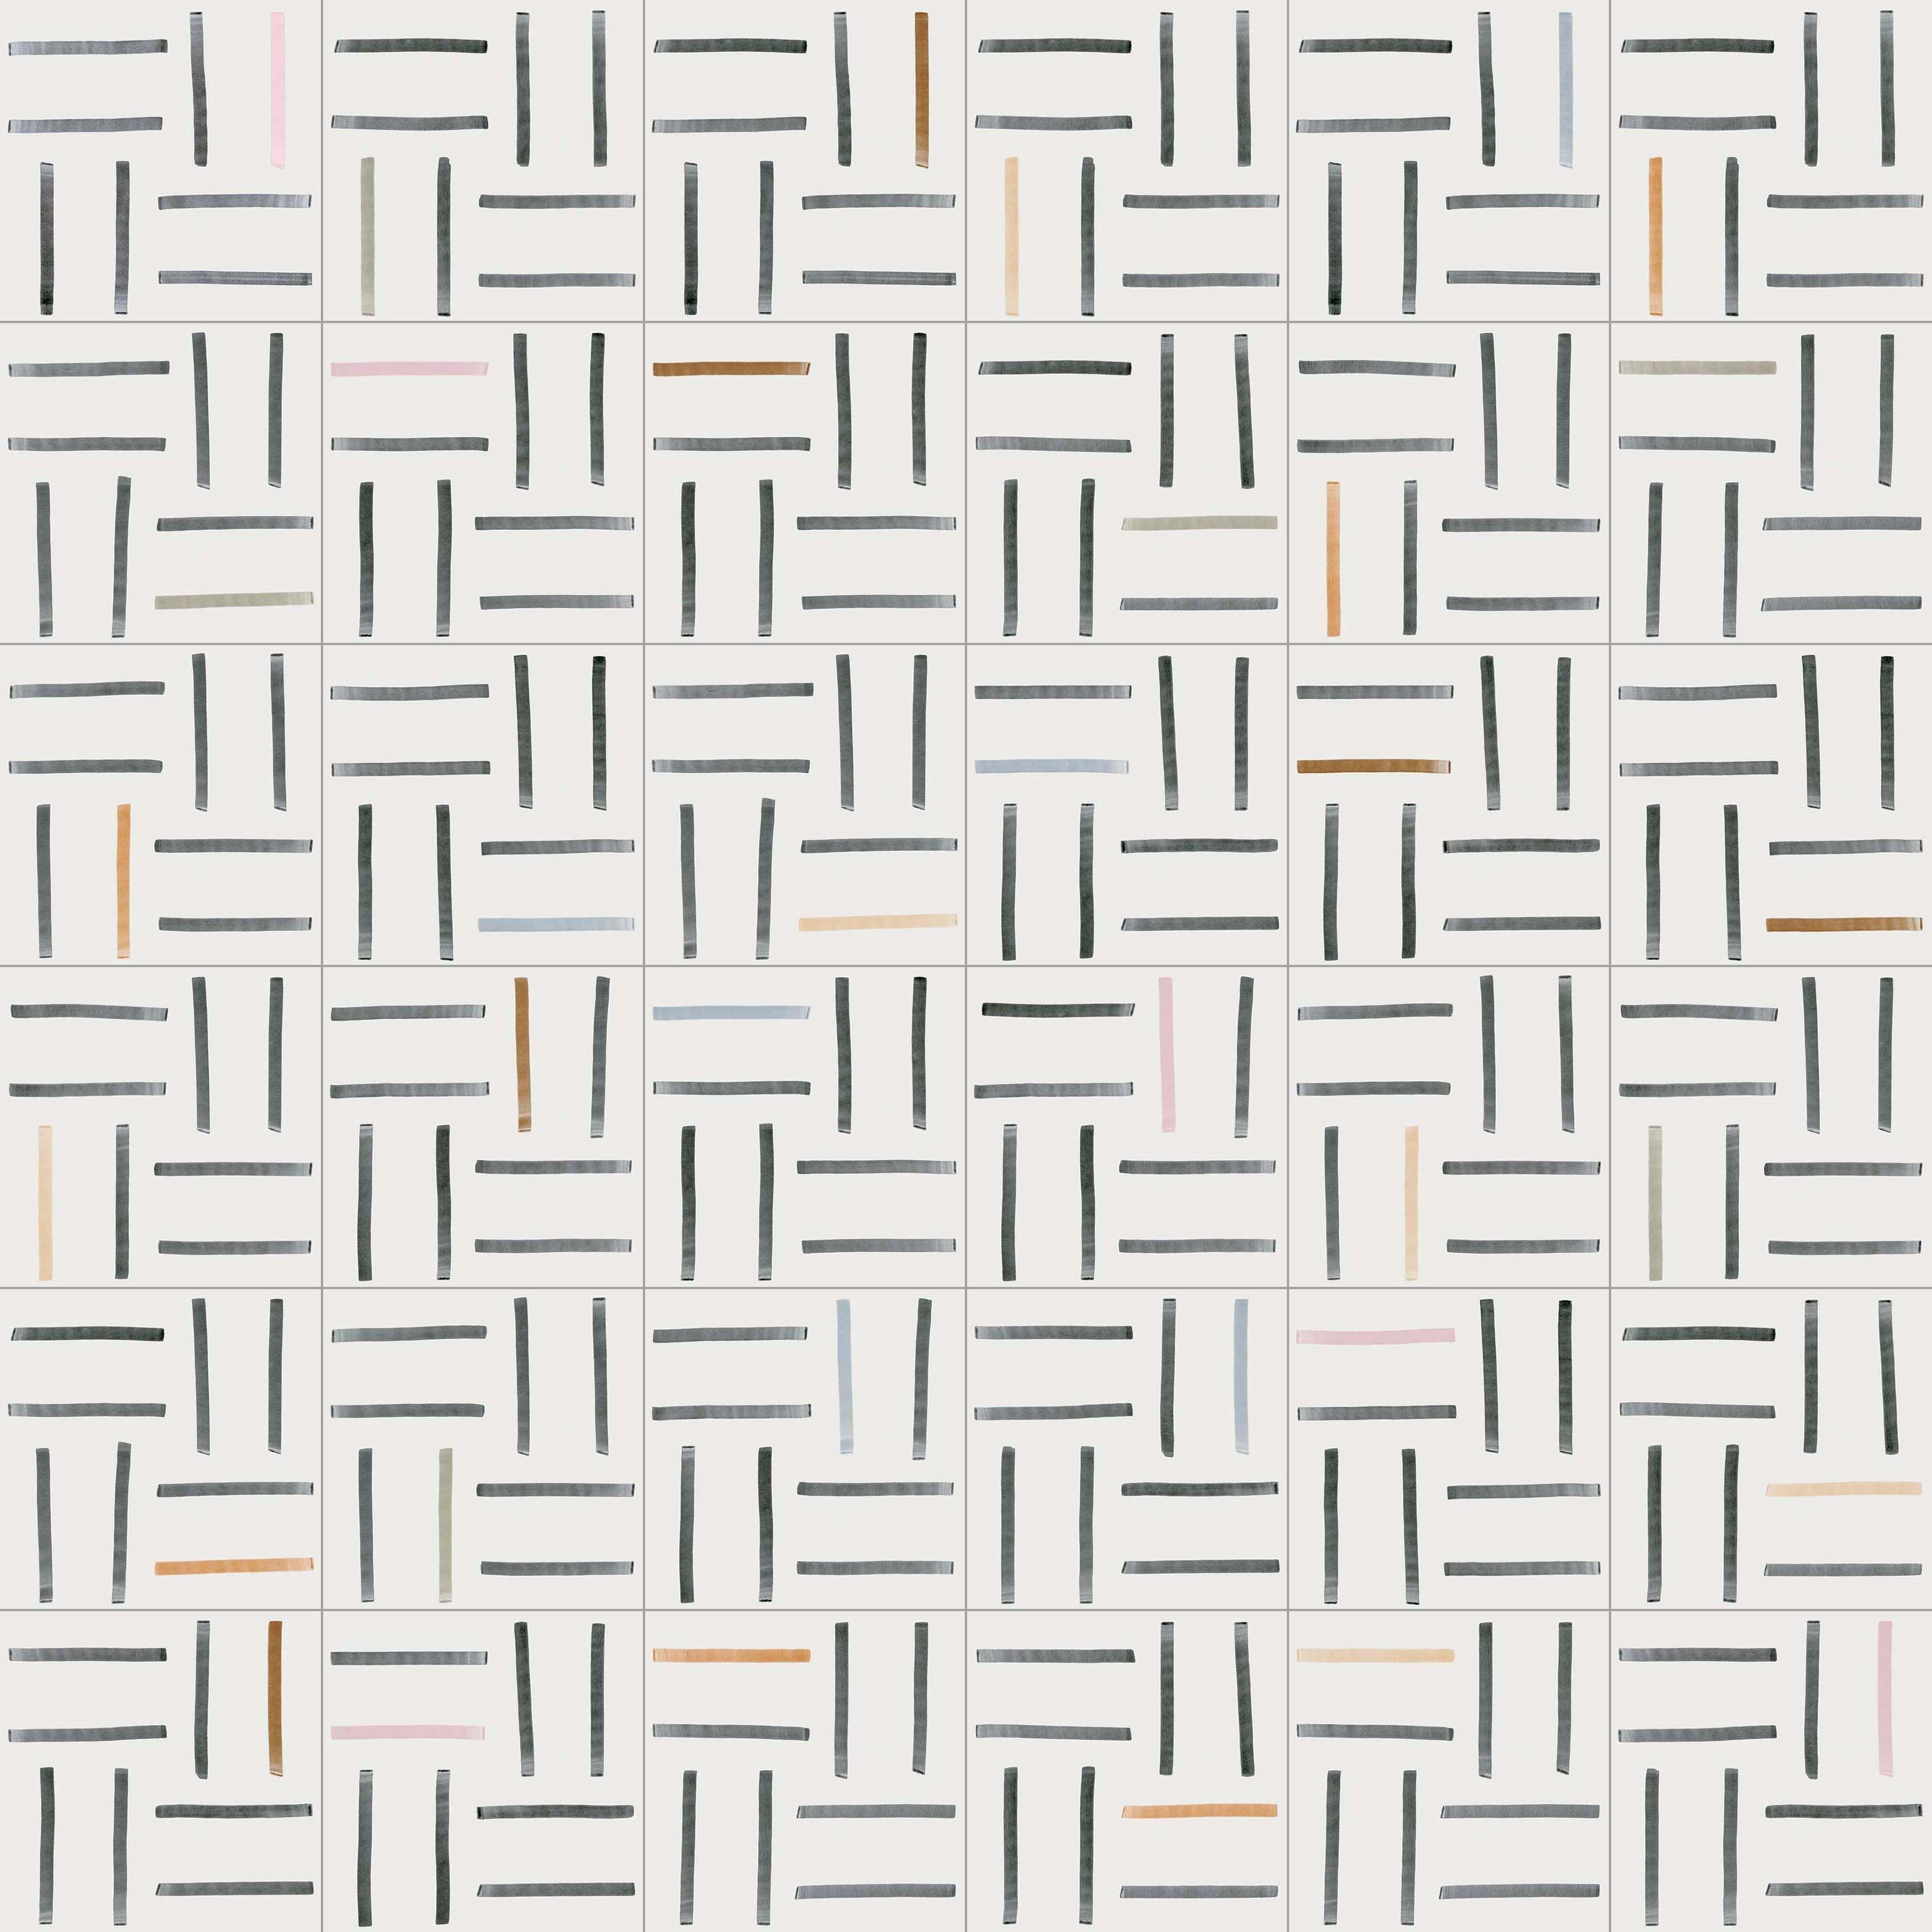 Vives Pavimento Porcel Nico Maori 20×20 Sukaldeak  # Muebles Nikea Campello